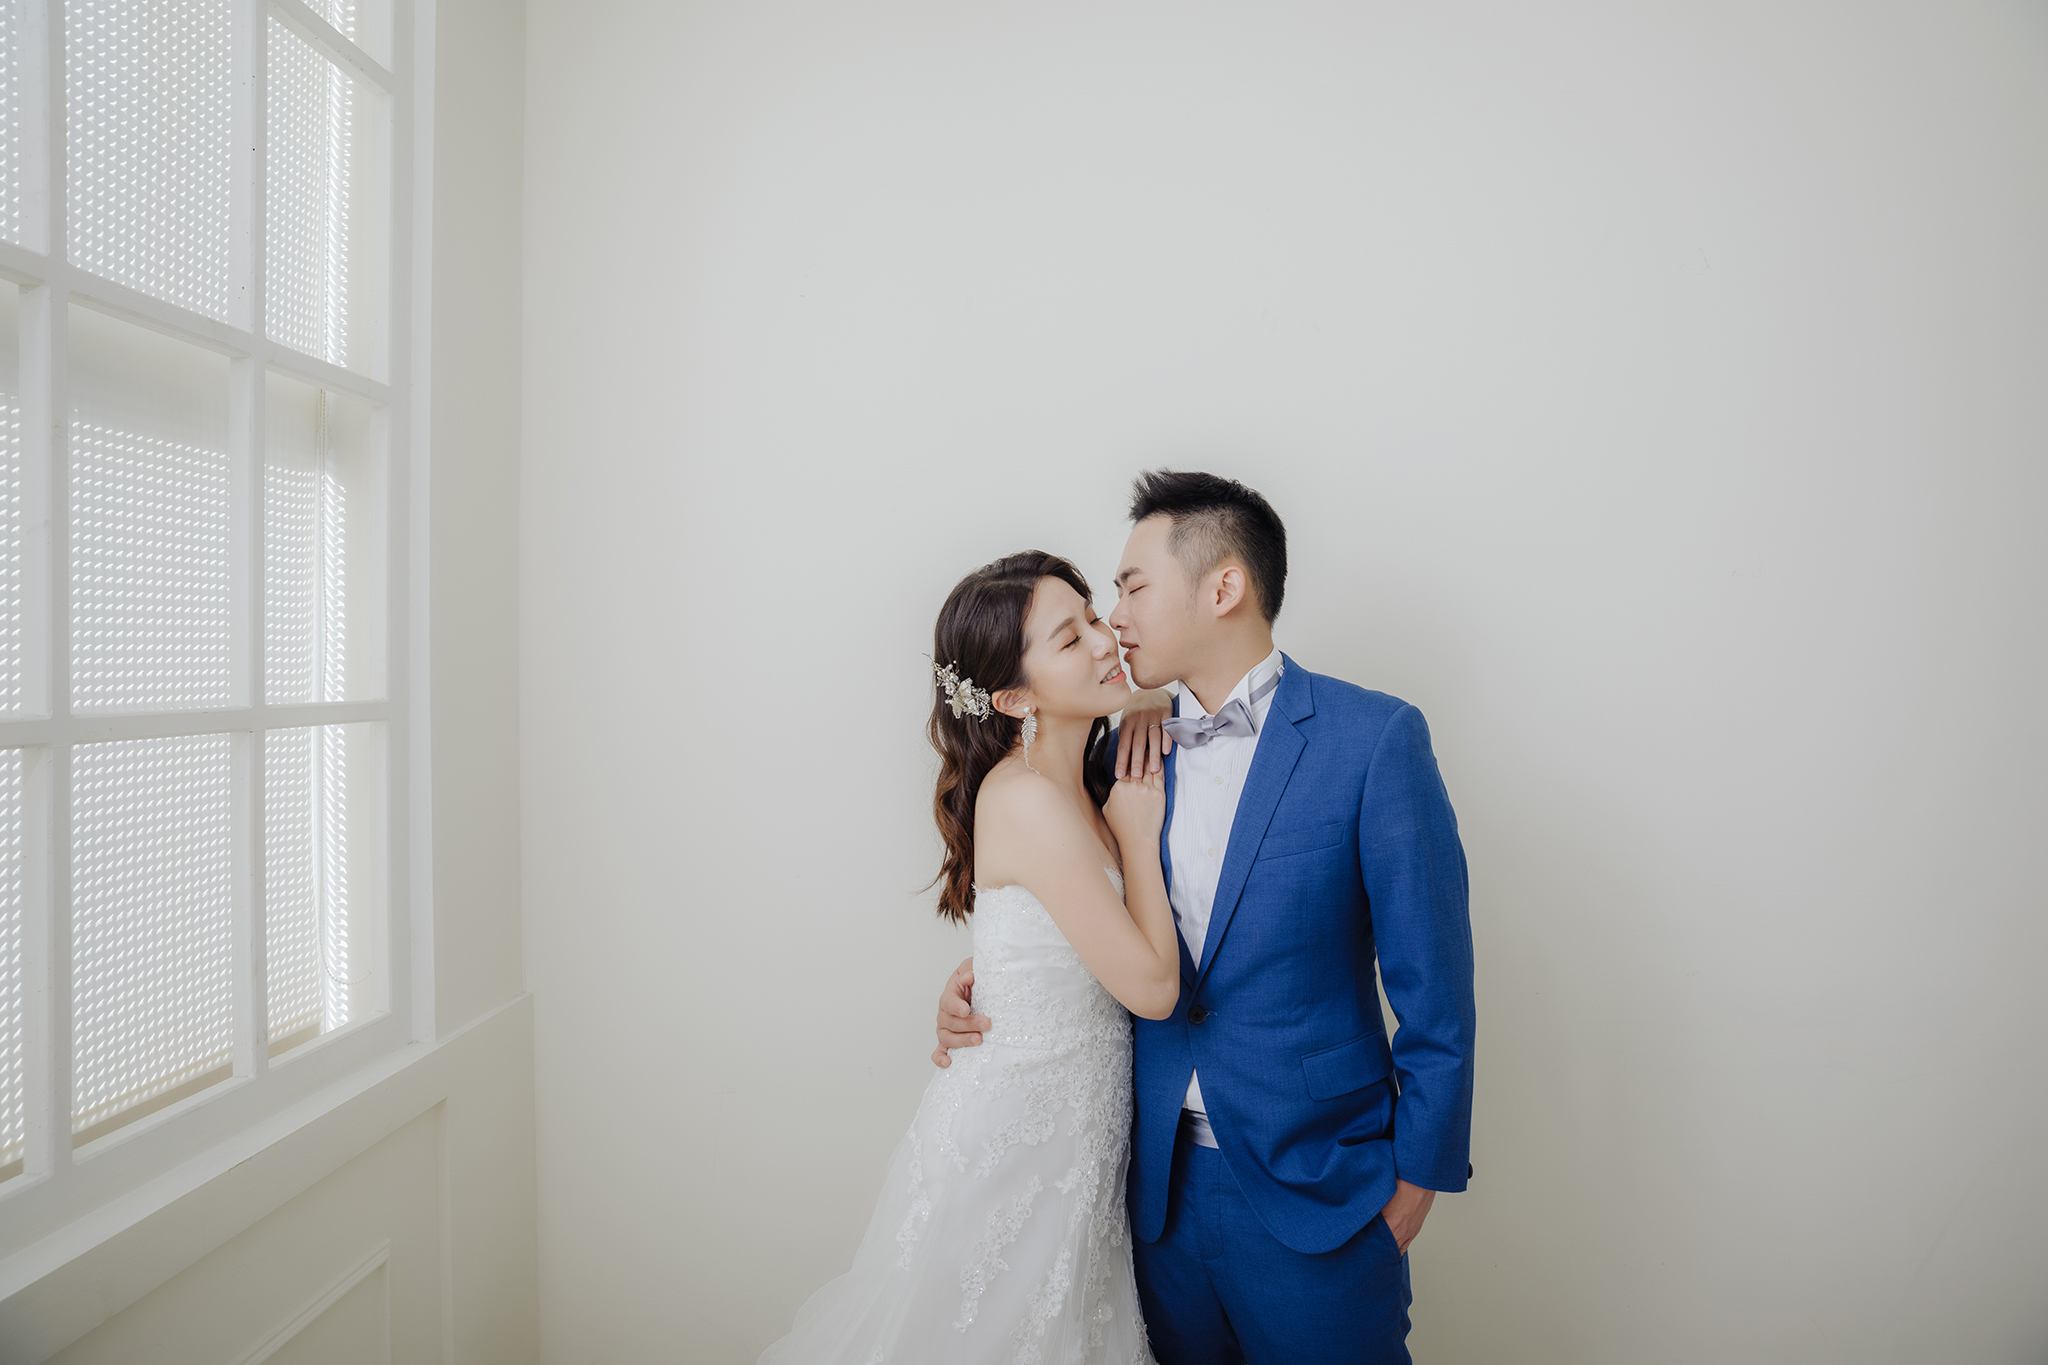 49598769518 d6b35d1351 o - 【自助婚紗】+啟安&虹虹+